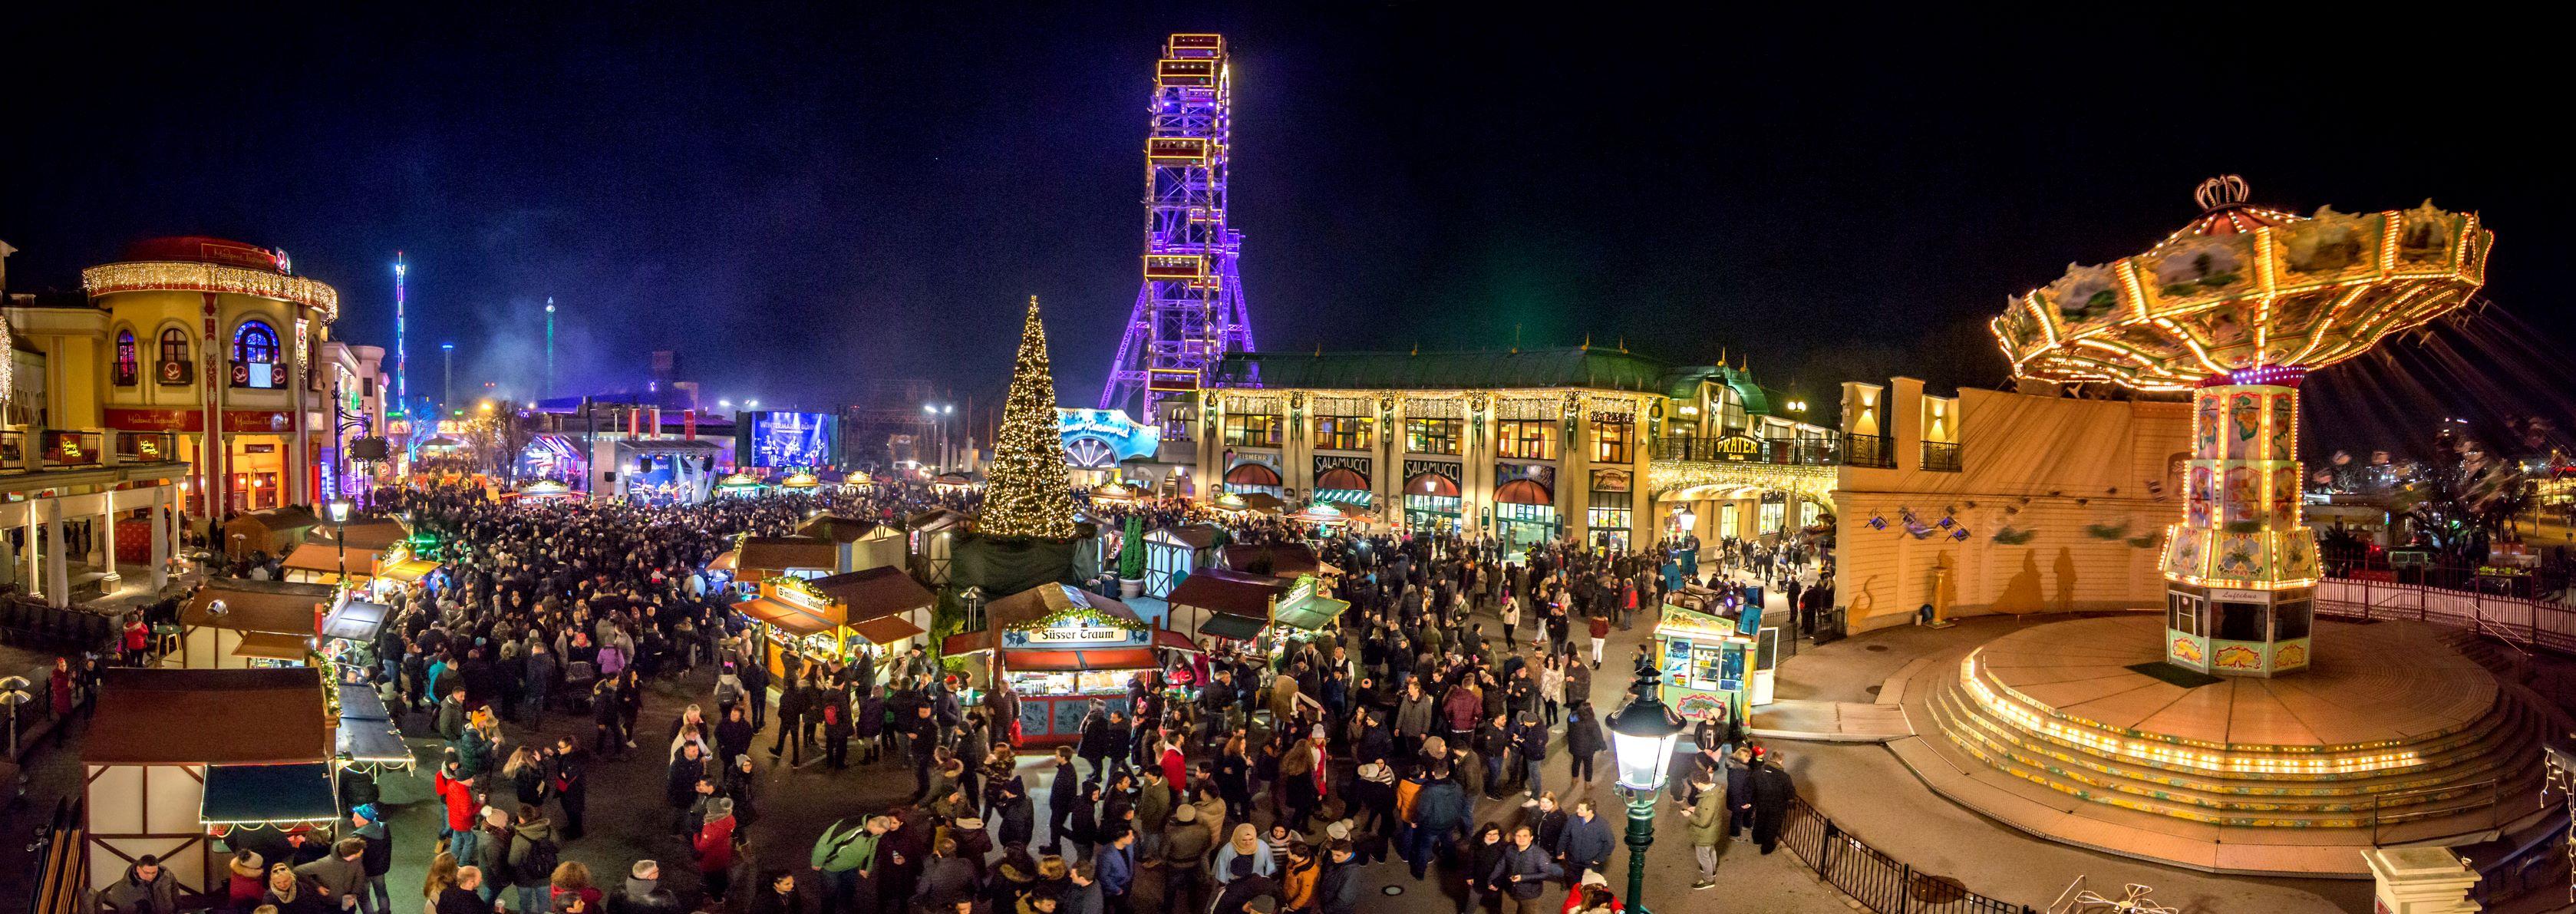 (c) Julius Silver_Wintermarkt VI